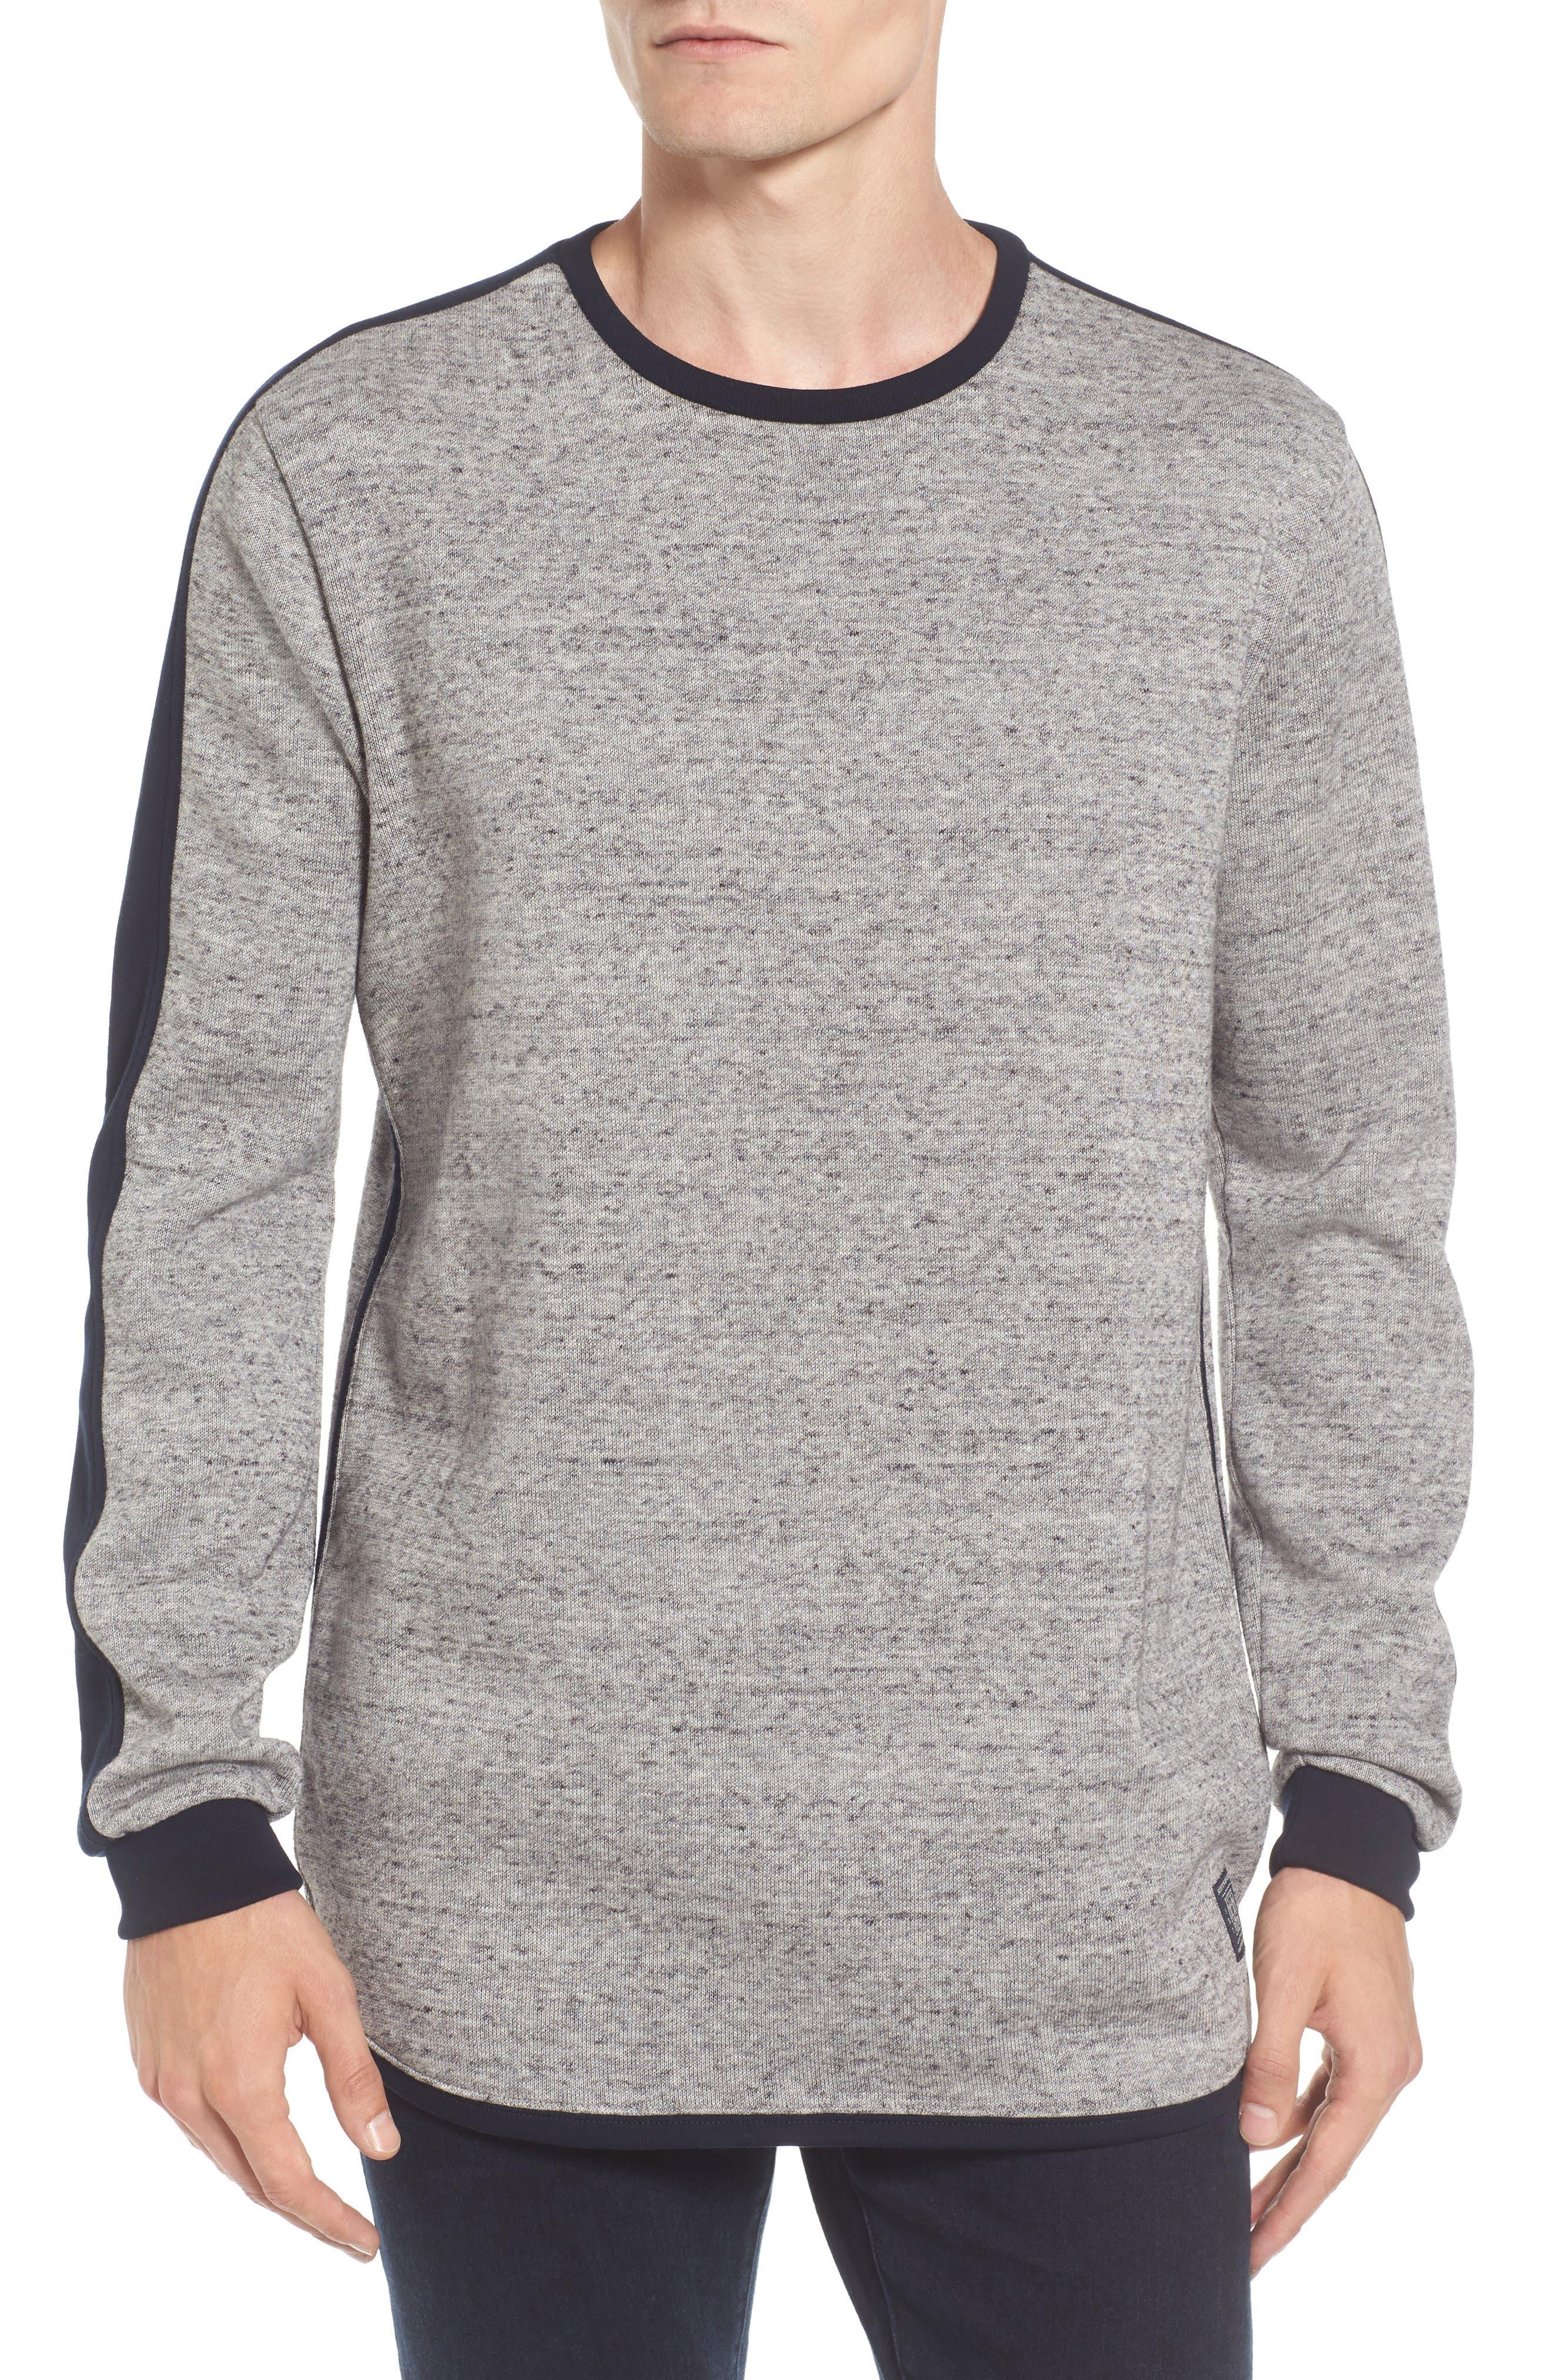 Panel Sweatshirt,                             Main thumbnail 1, color,                             Grey